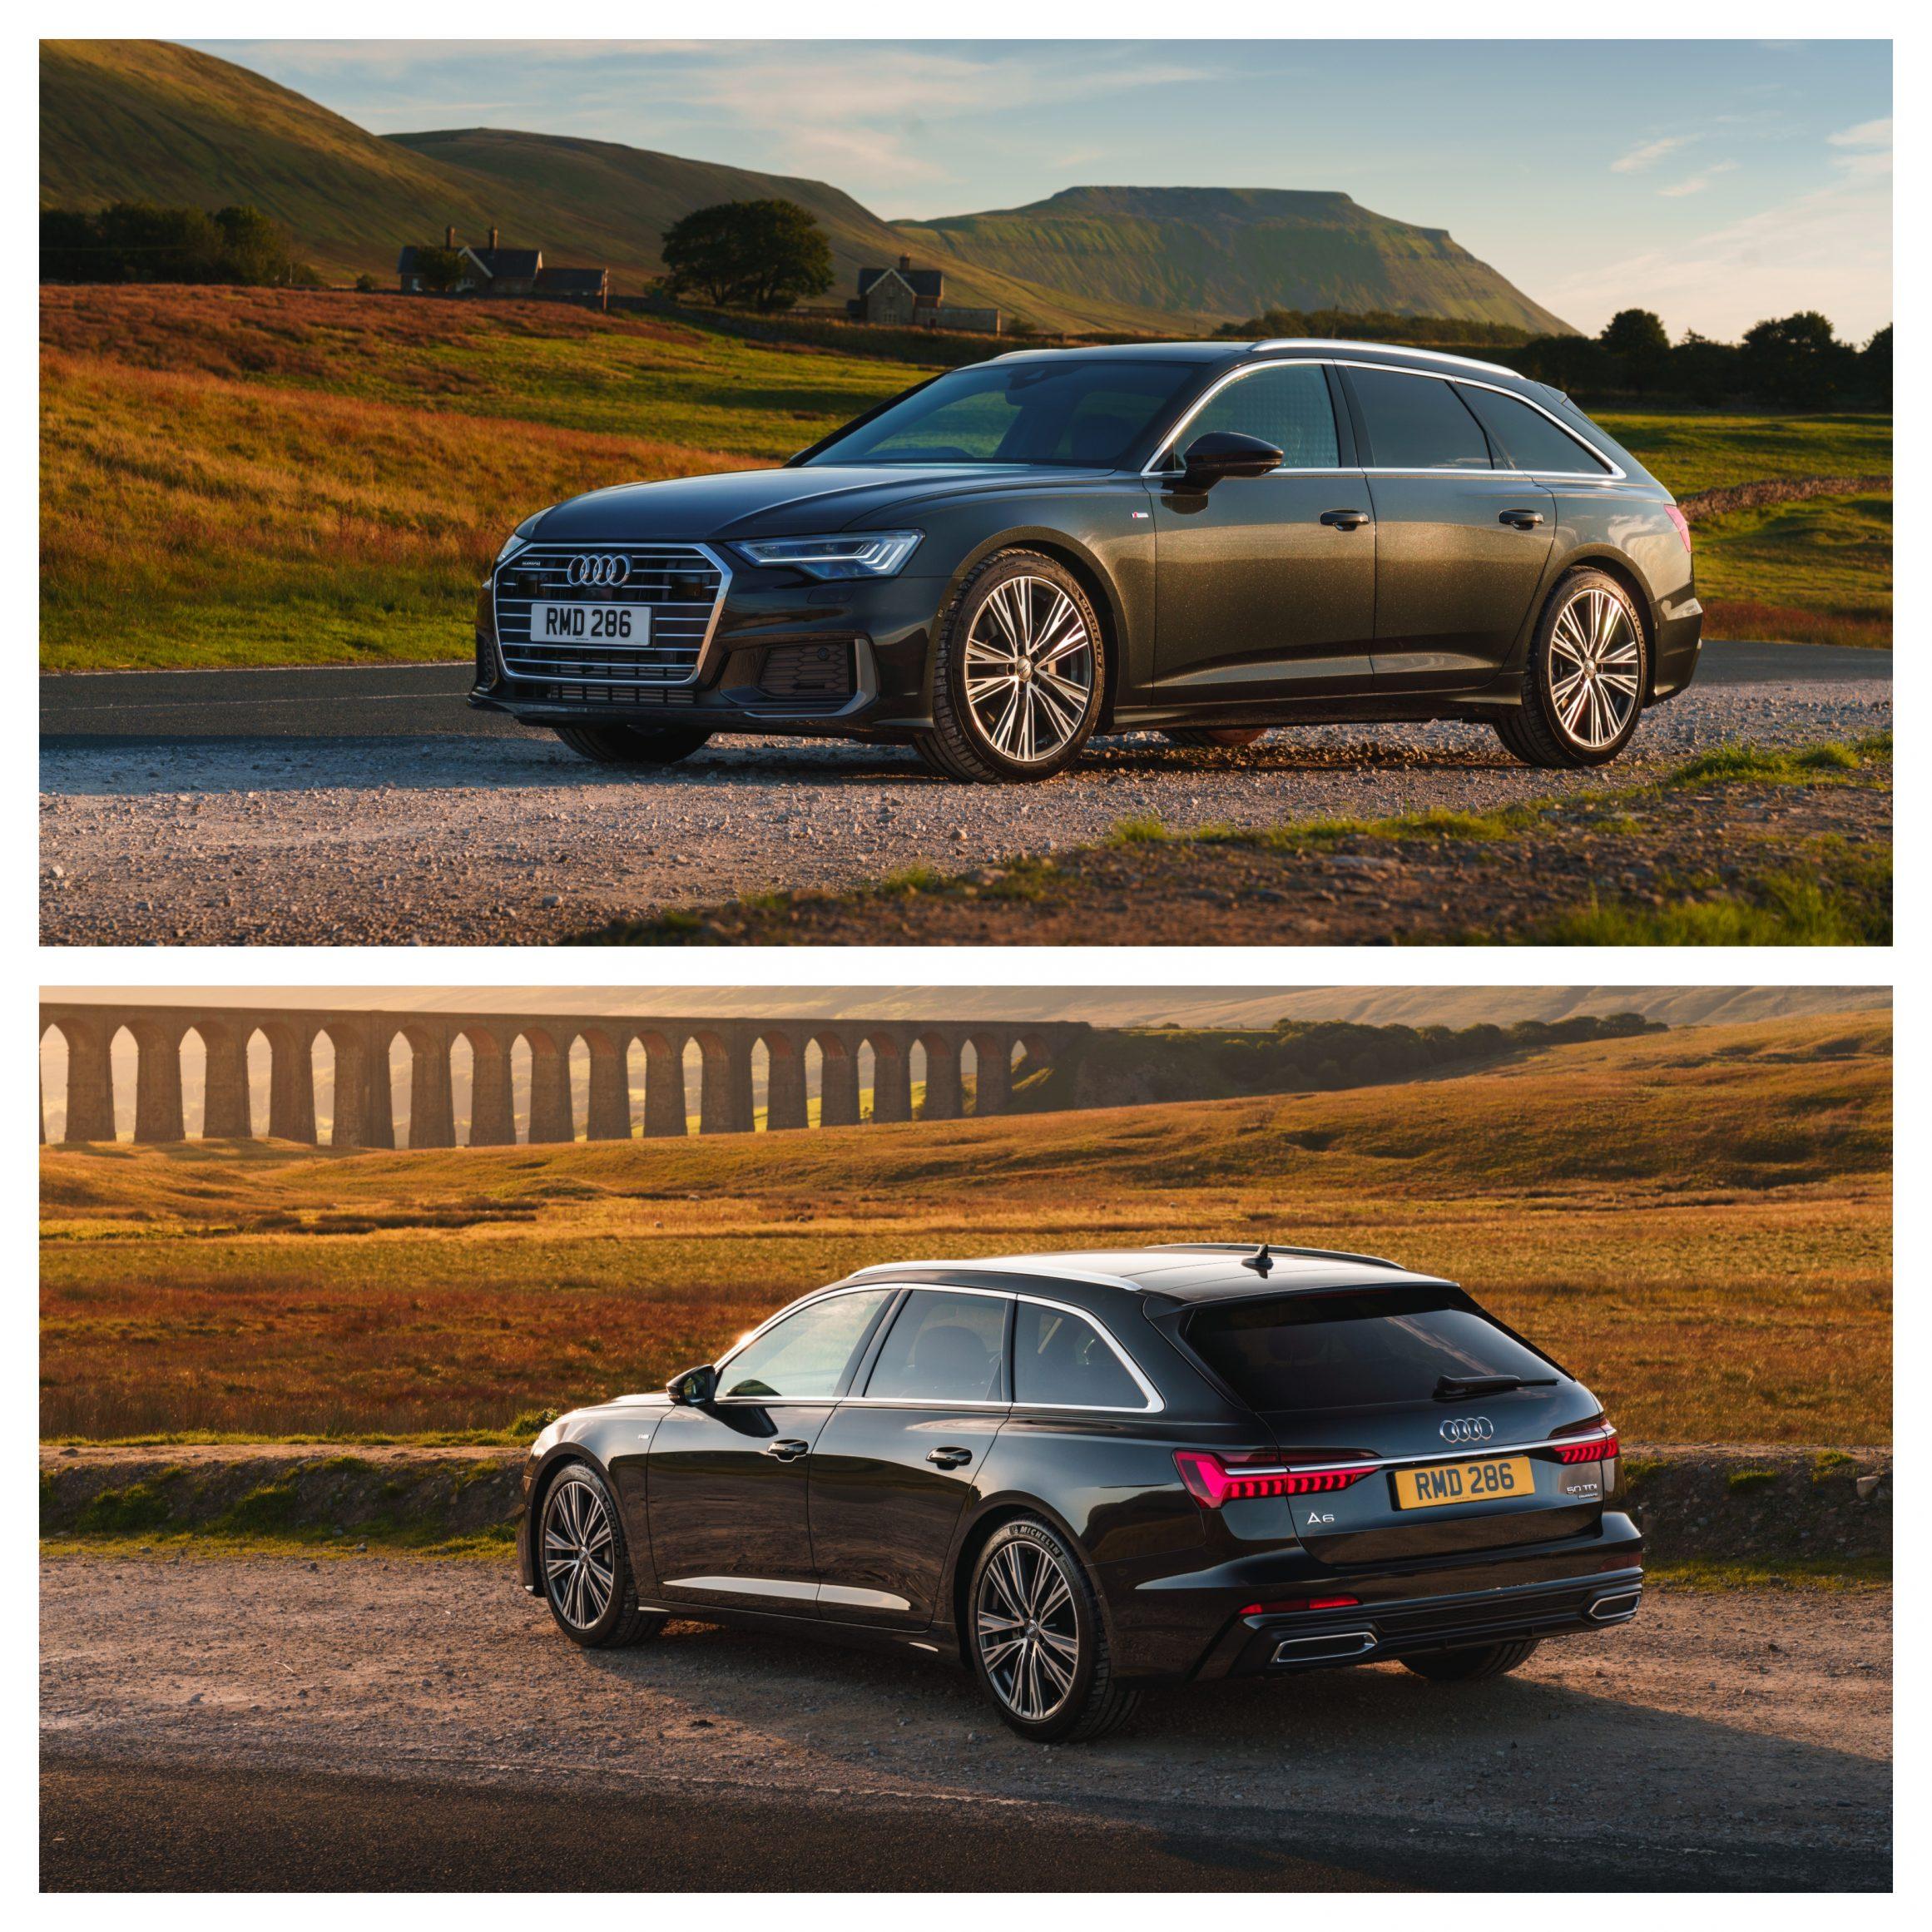 Best estate cars - Audi A6 Avant